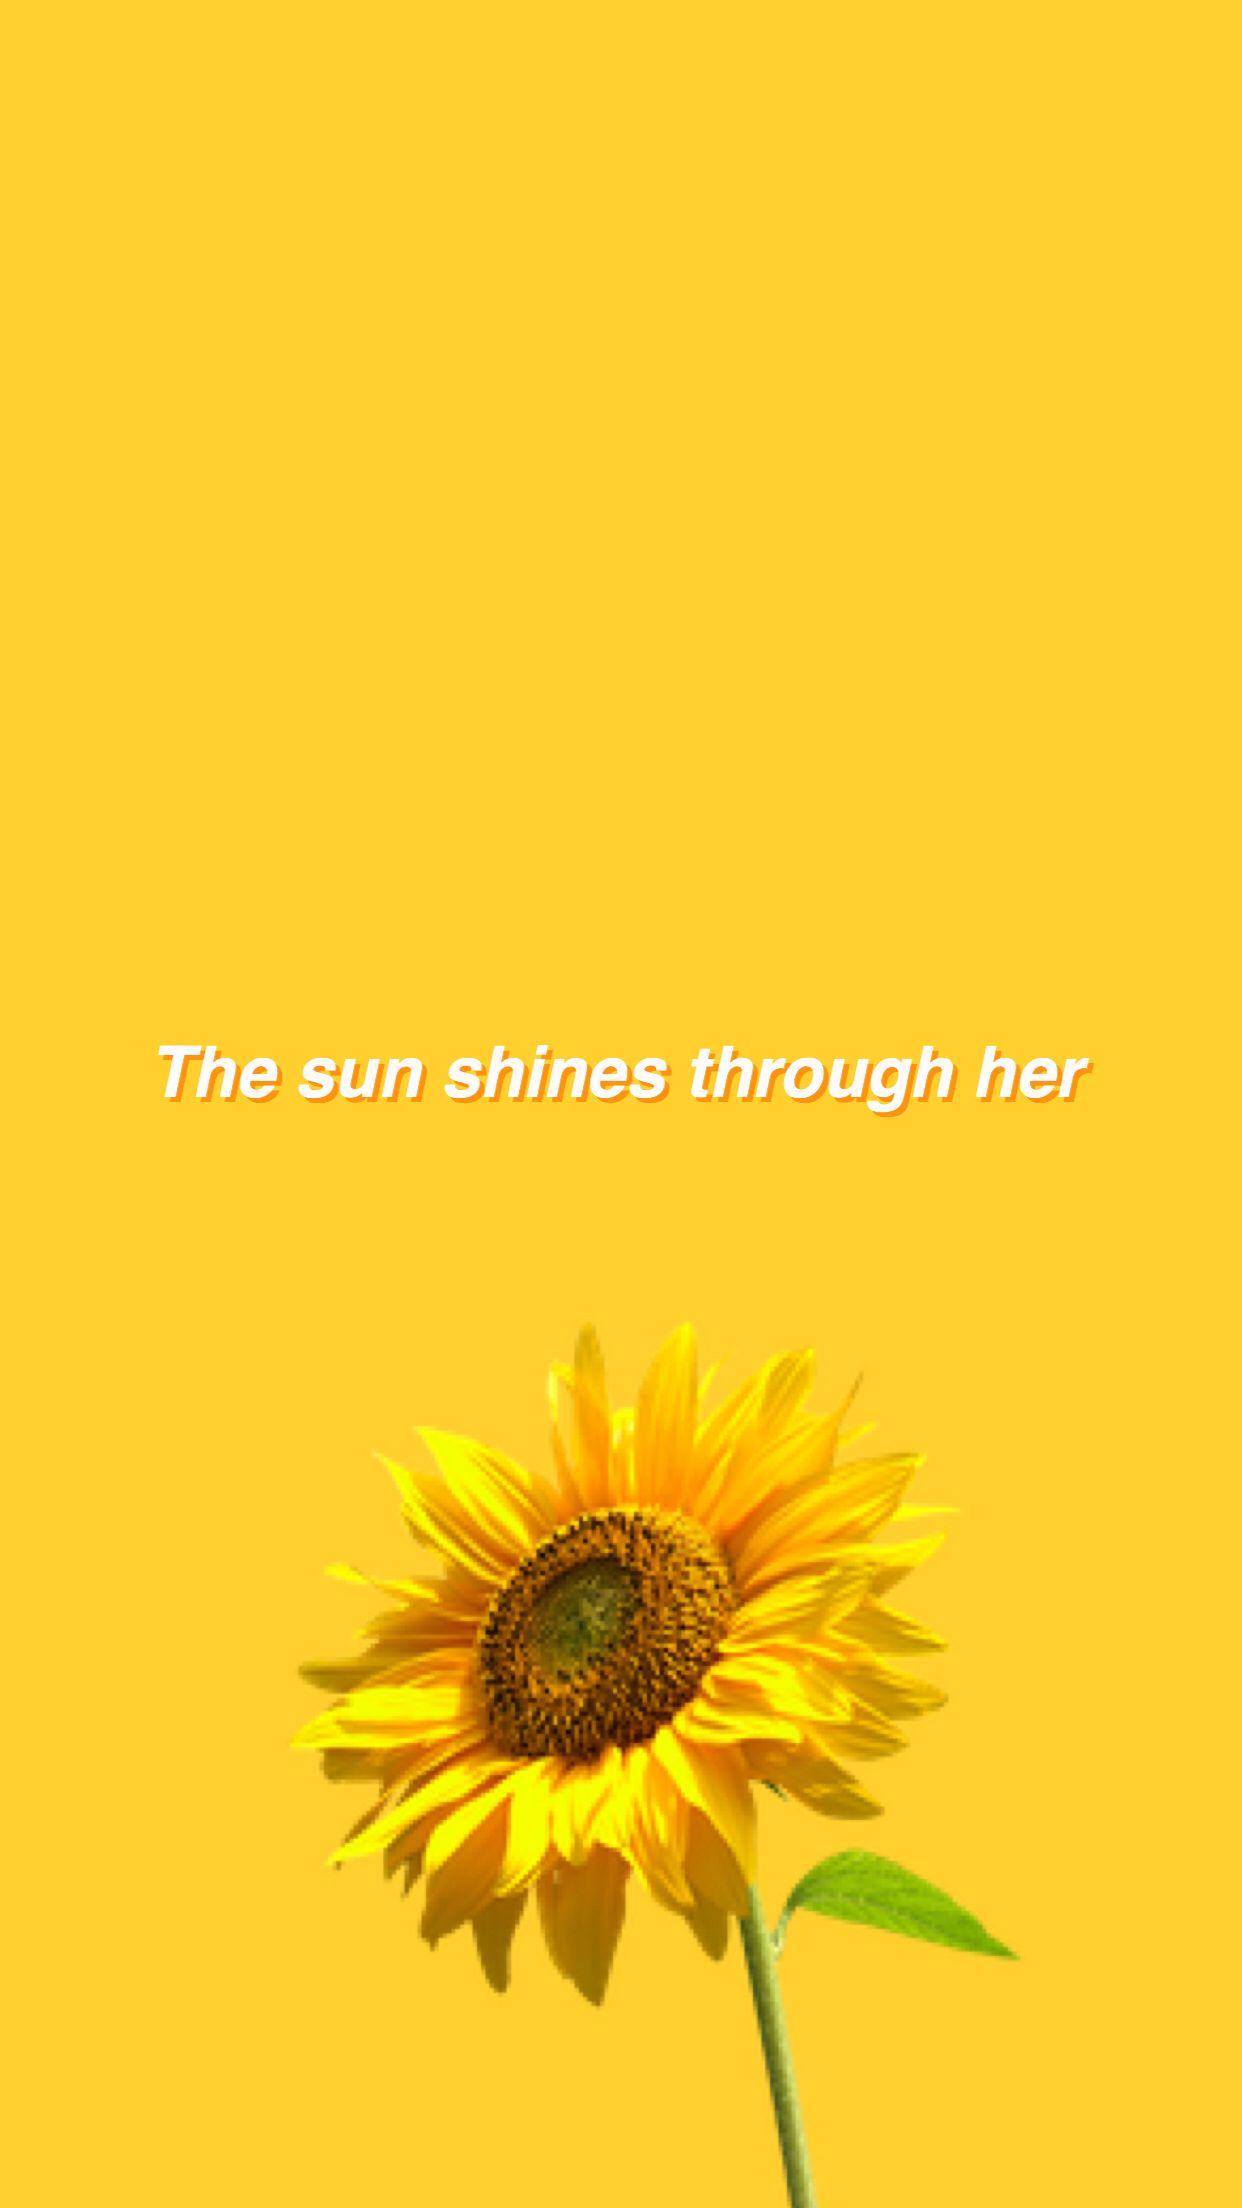 Yellow Aesthetic Wallpaper Desktop Posted By Sarah Mercado